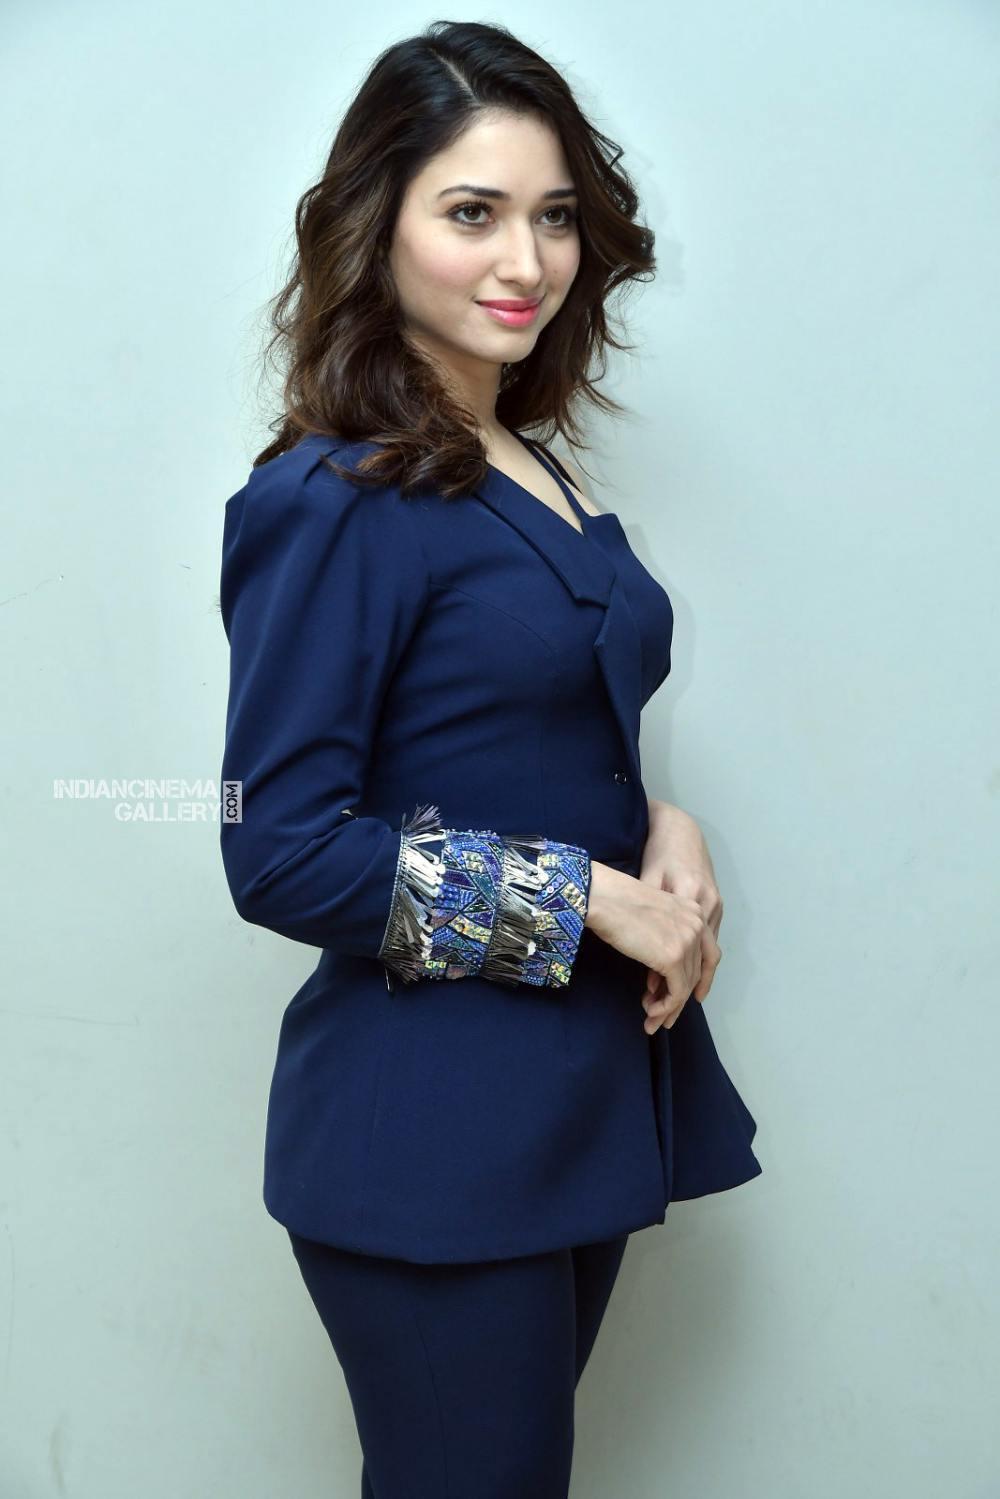 Tamanna Bhatia at f2 movie trailer launch (17)